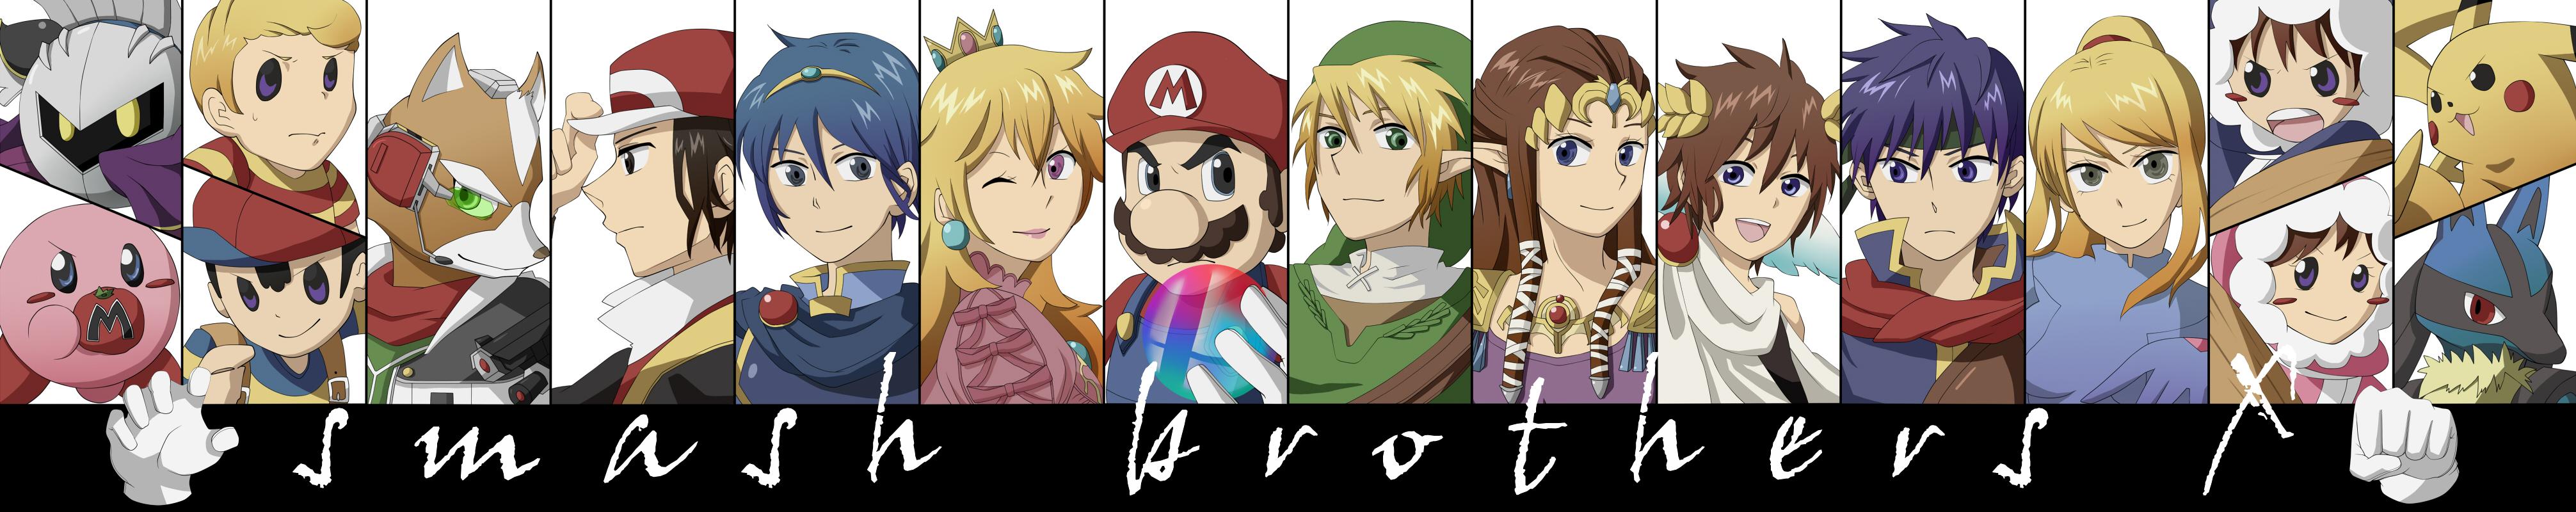 Anime Characters For Smash : Super smash bros image  zerochan anime board